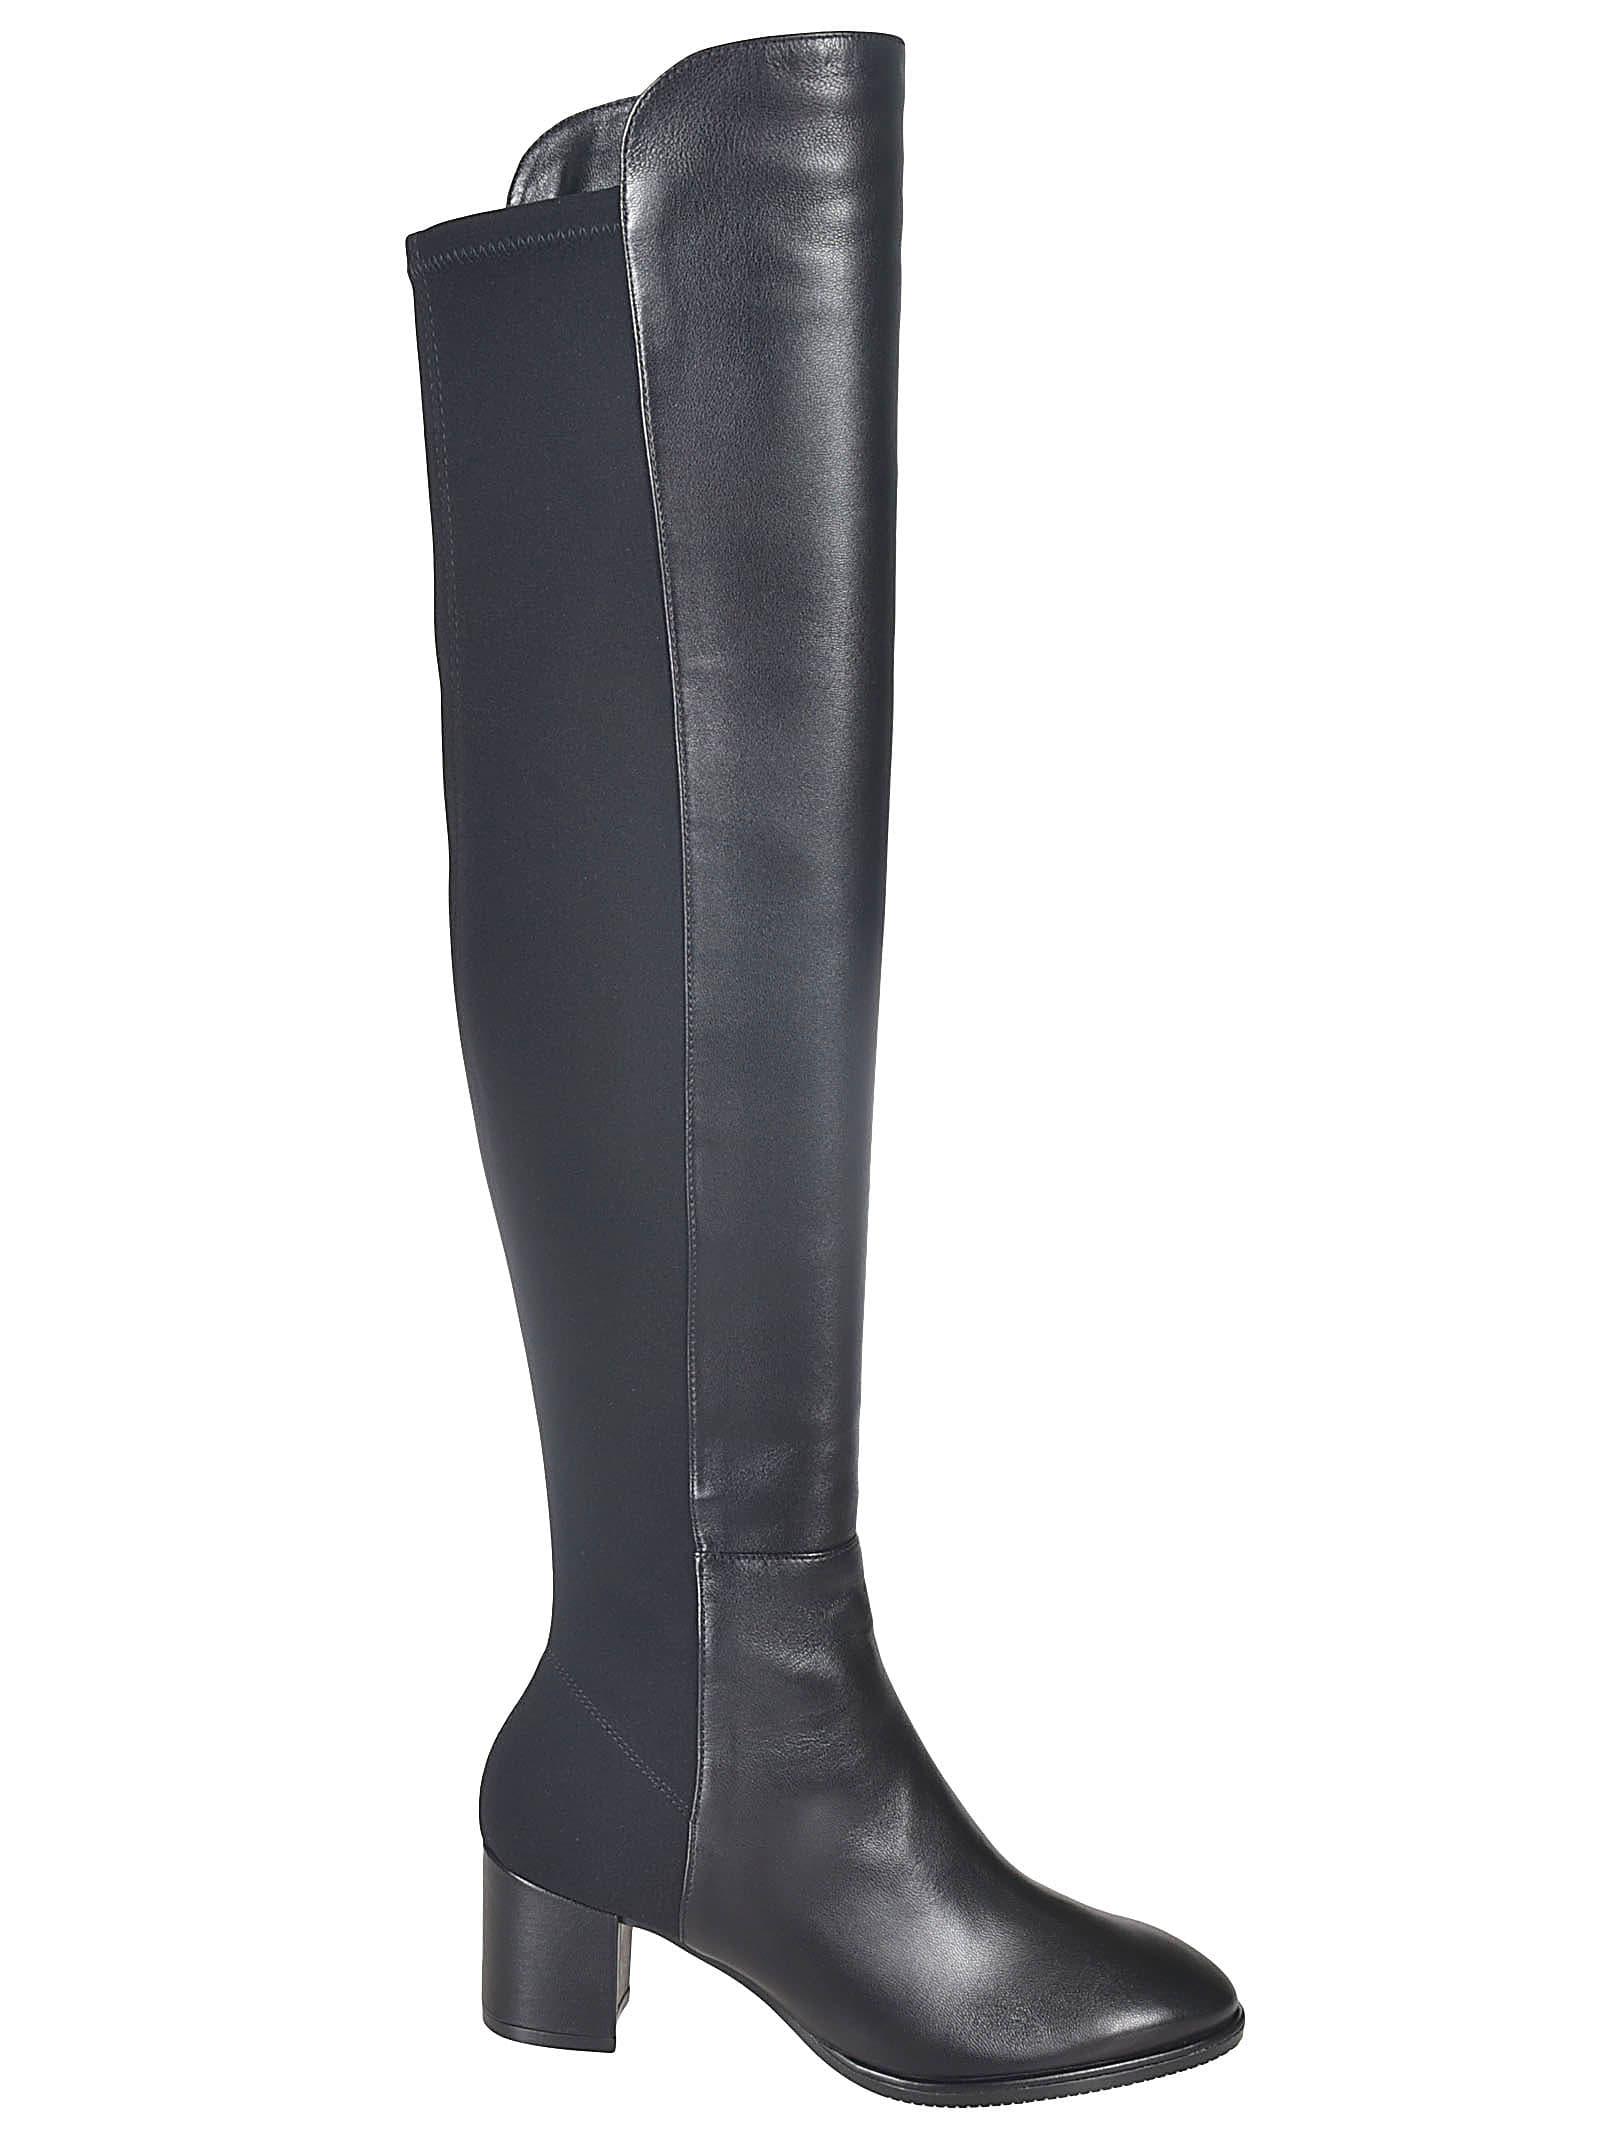 Buy Stuart Weitzman Harper 60 Over-the-knee Boots online, shop Stuart Weitzman shoes with free shipping